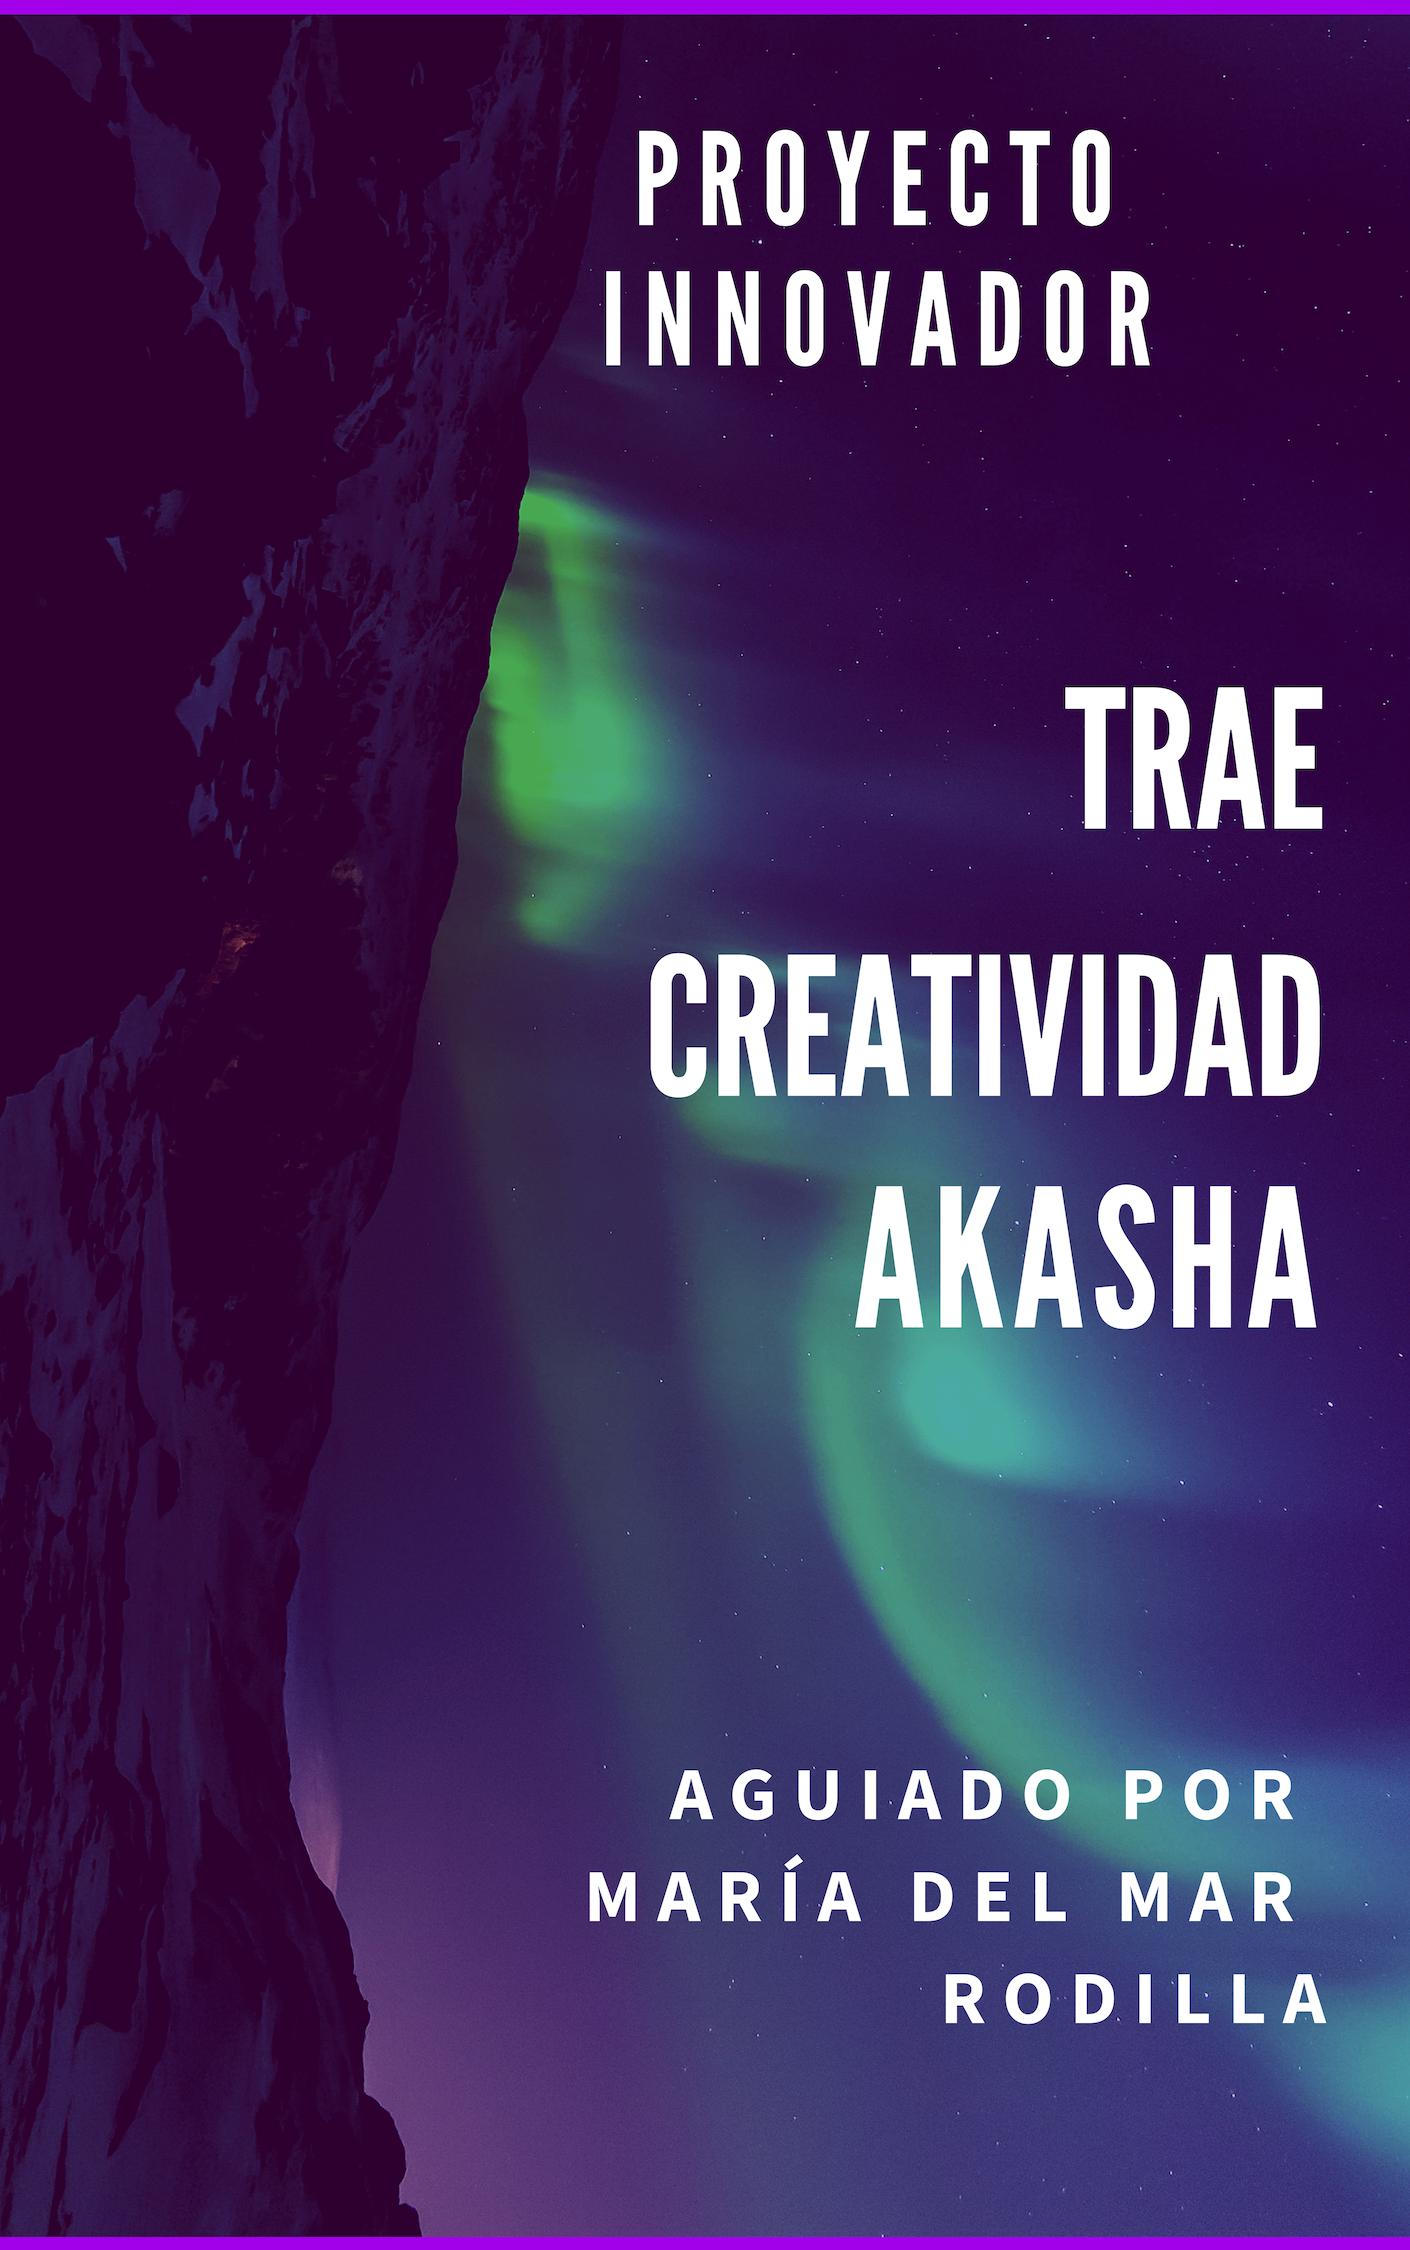 Trae creatividad akasha Proyecto innovador